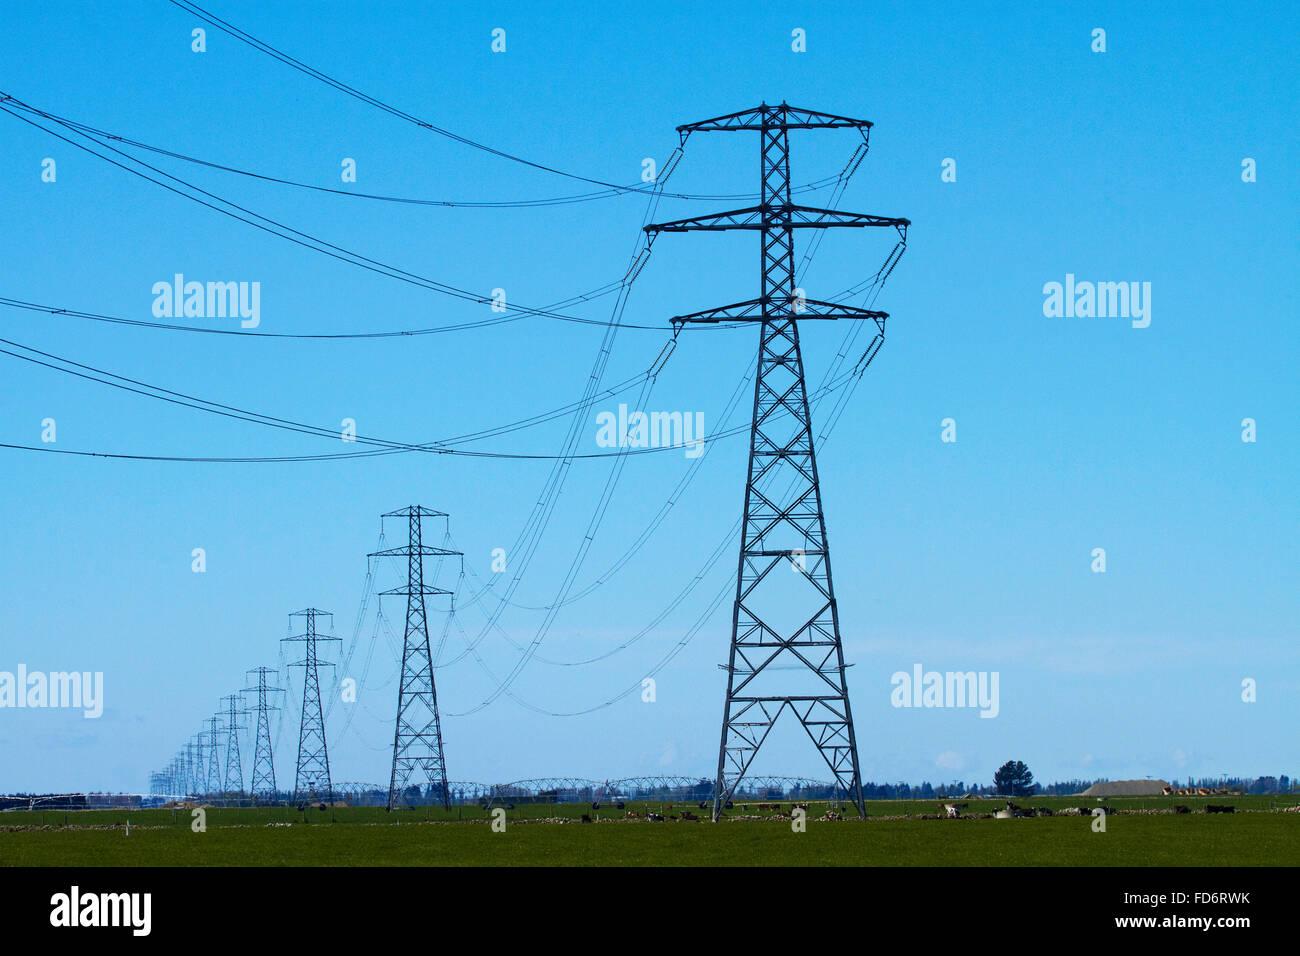 Row of power pylons, Mid Canterbury, South Island, New Zealand - Stock Image